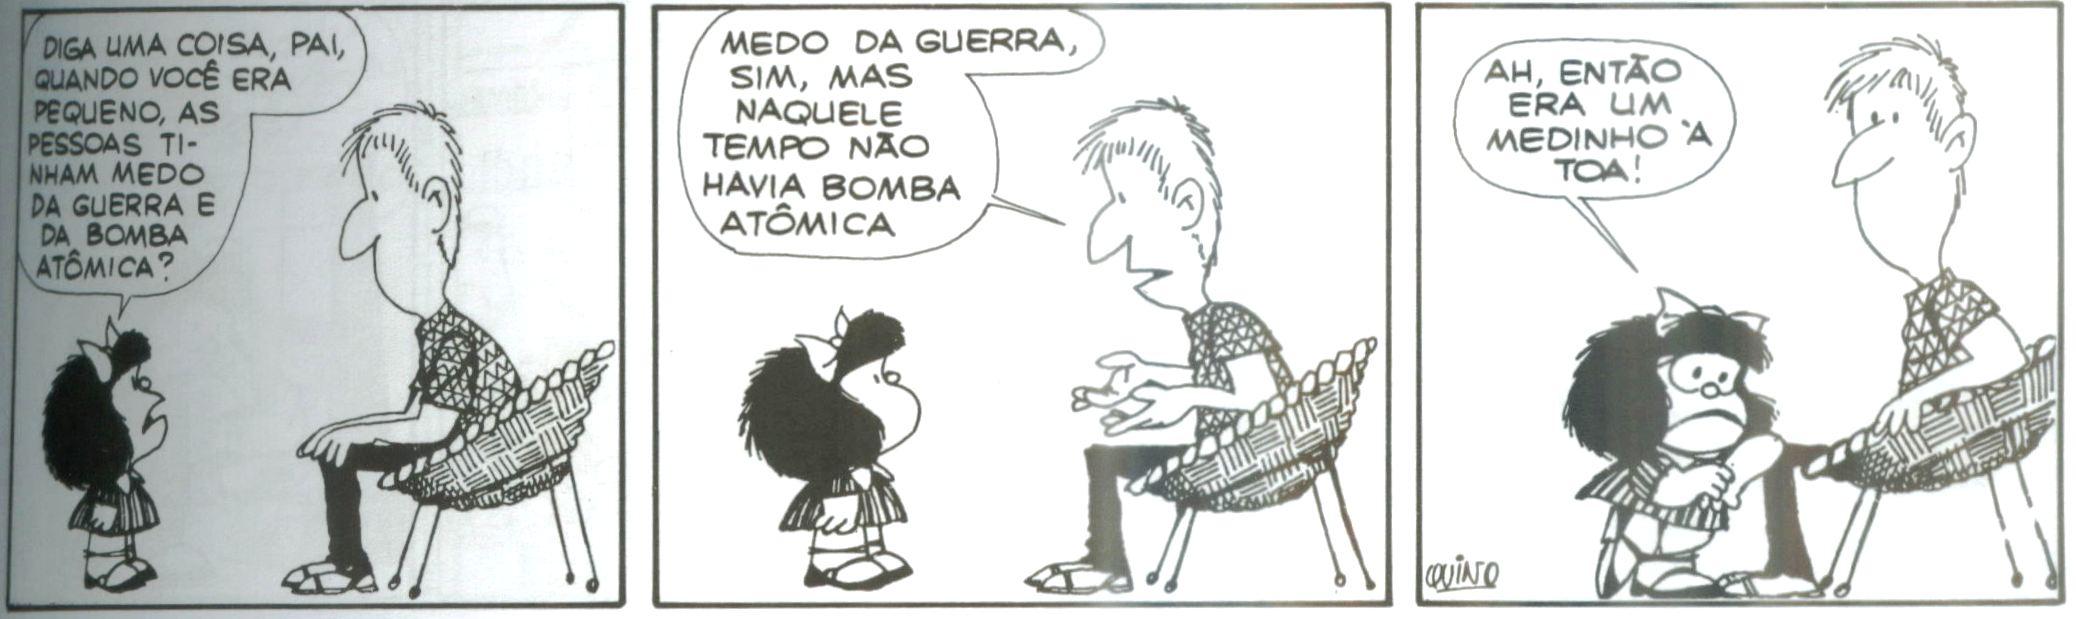 mafalda-g-nuclear